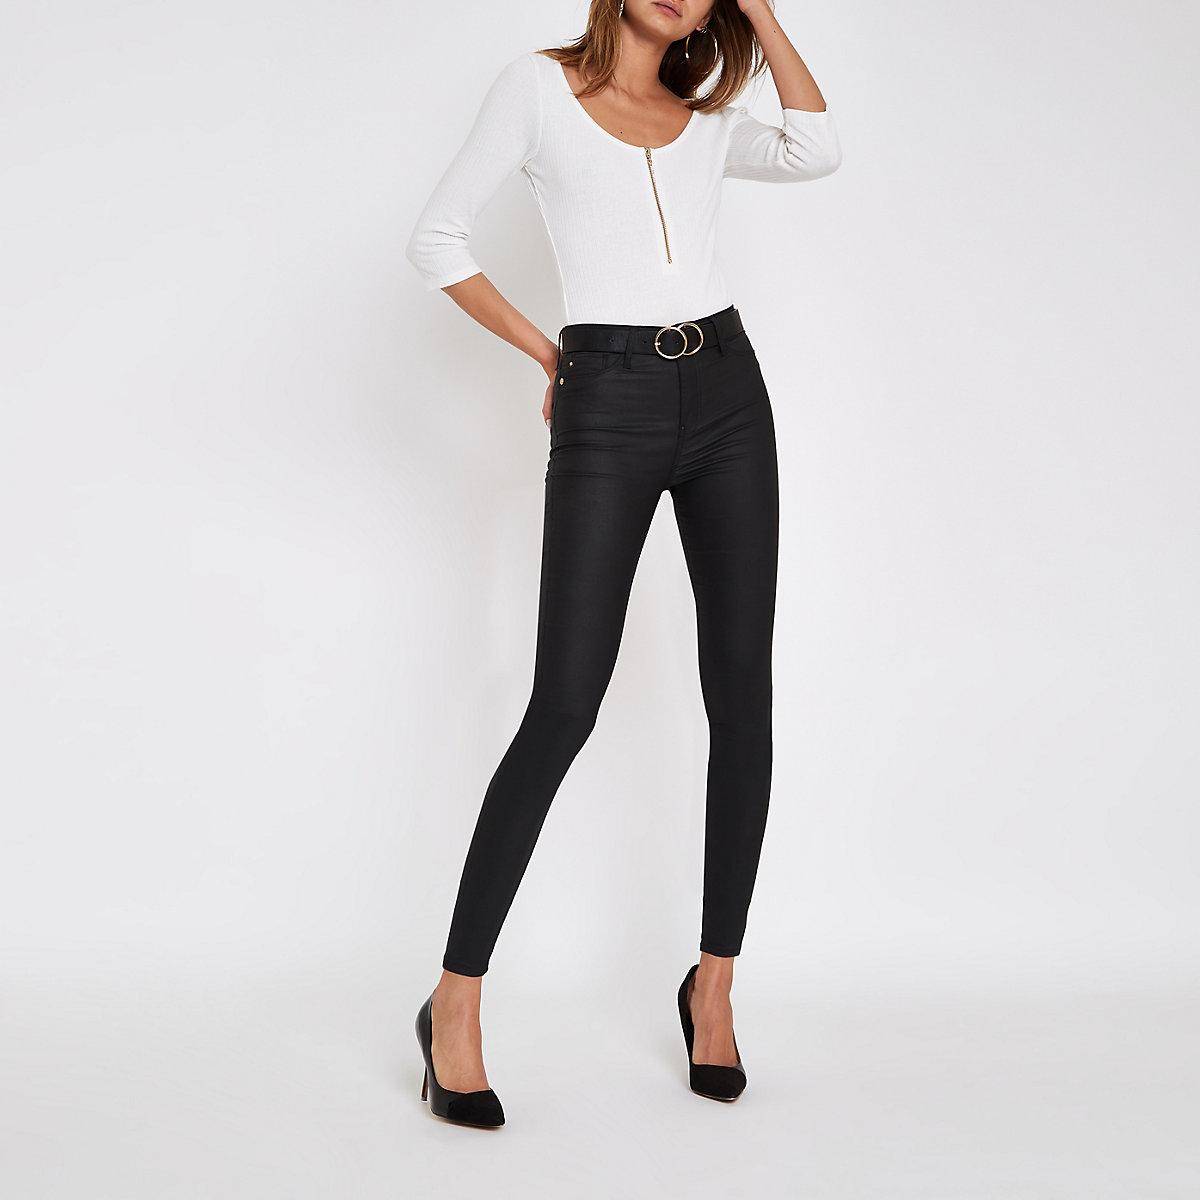 White diamante zip long sleeve bodysuit